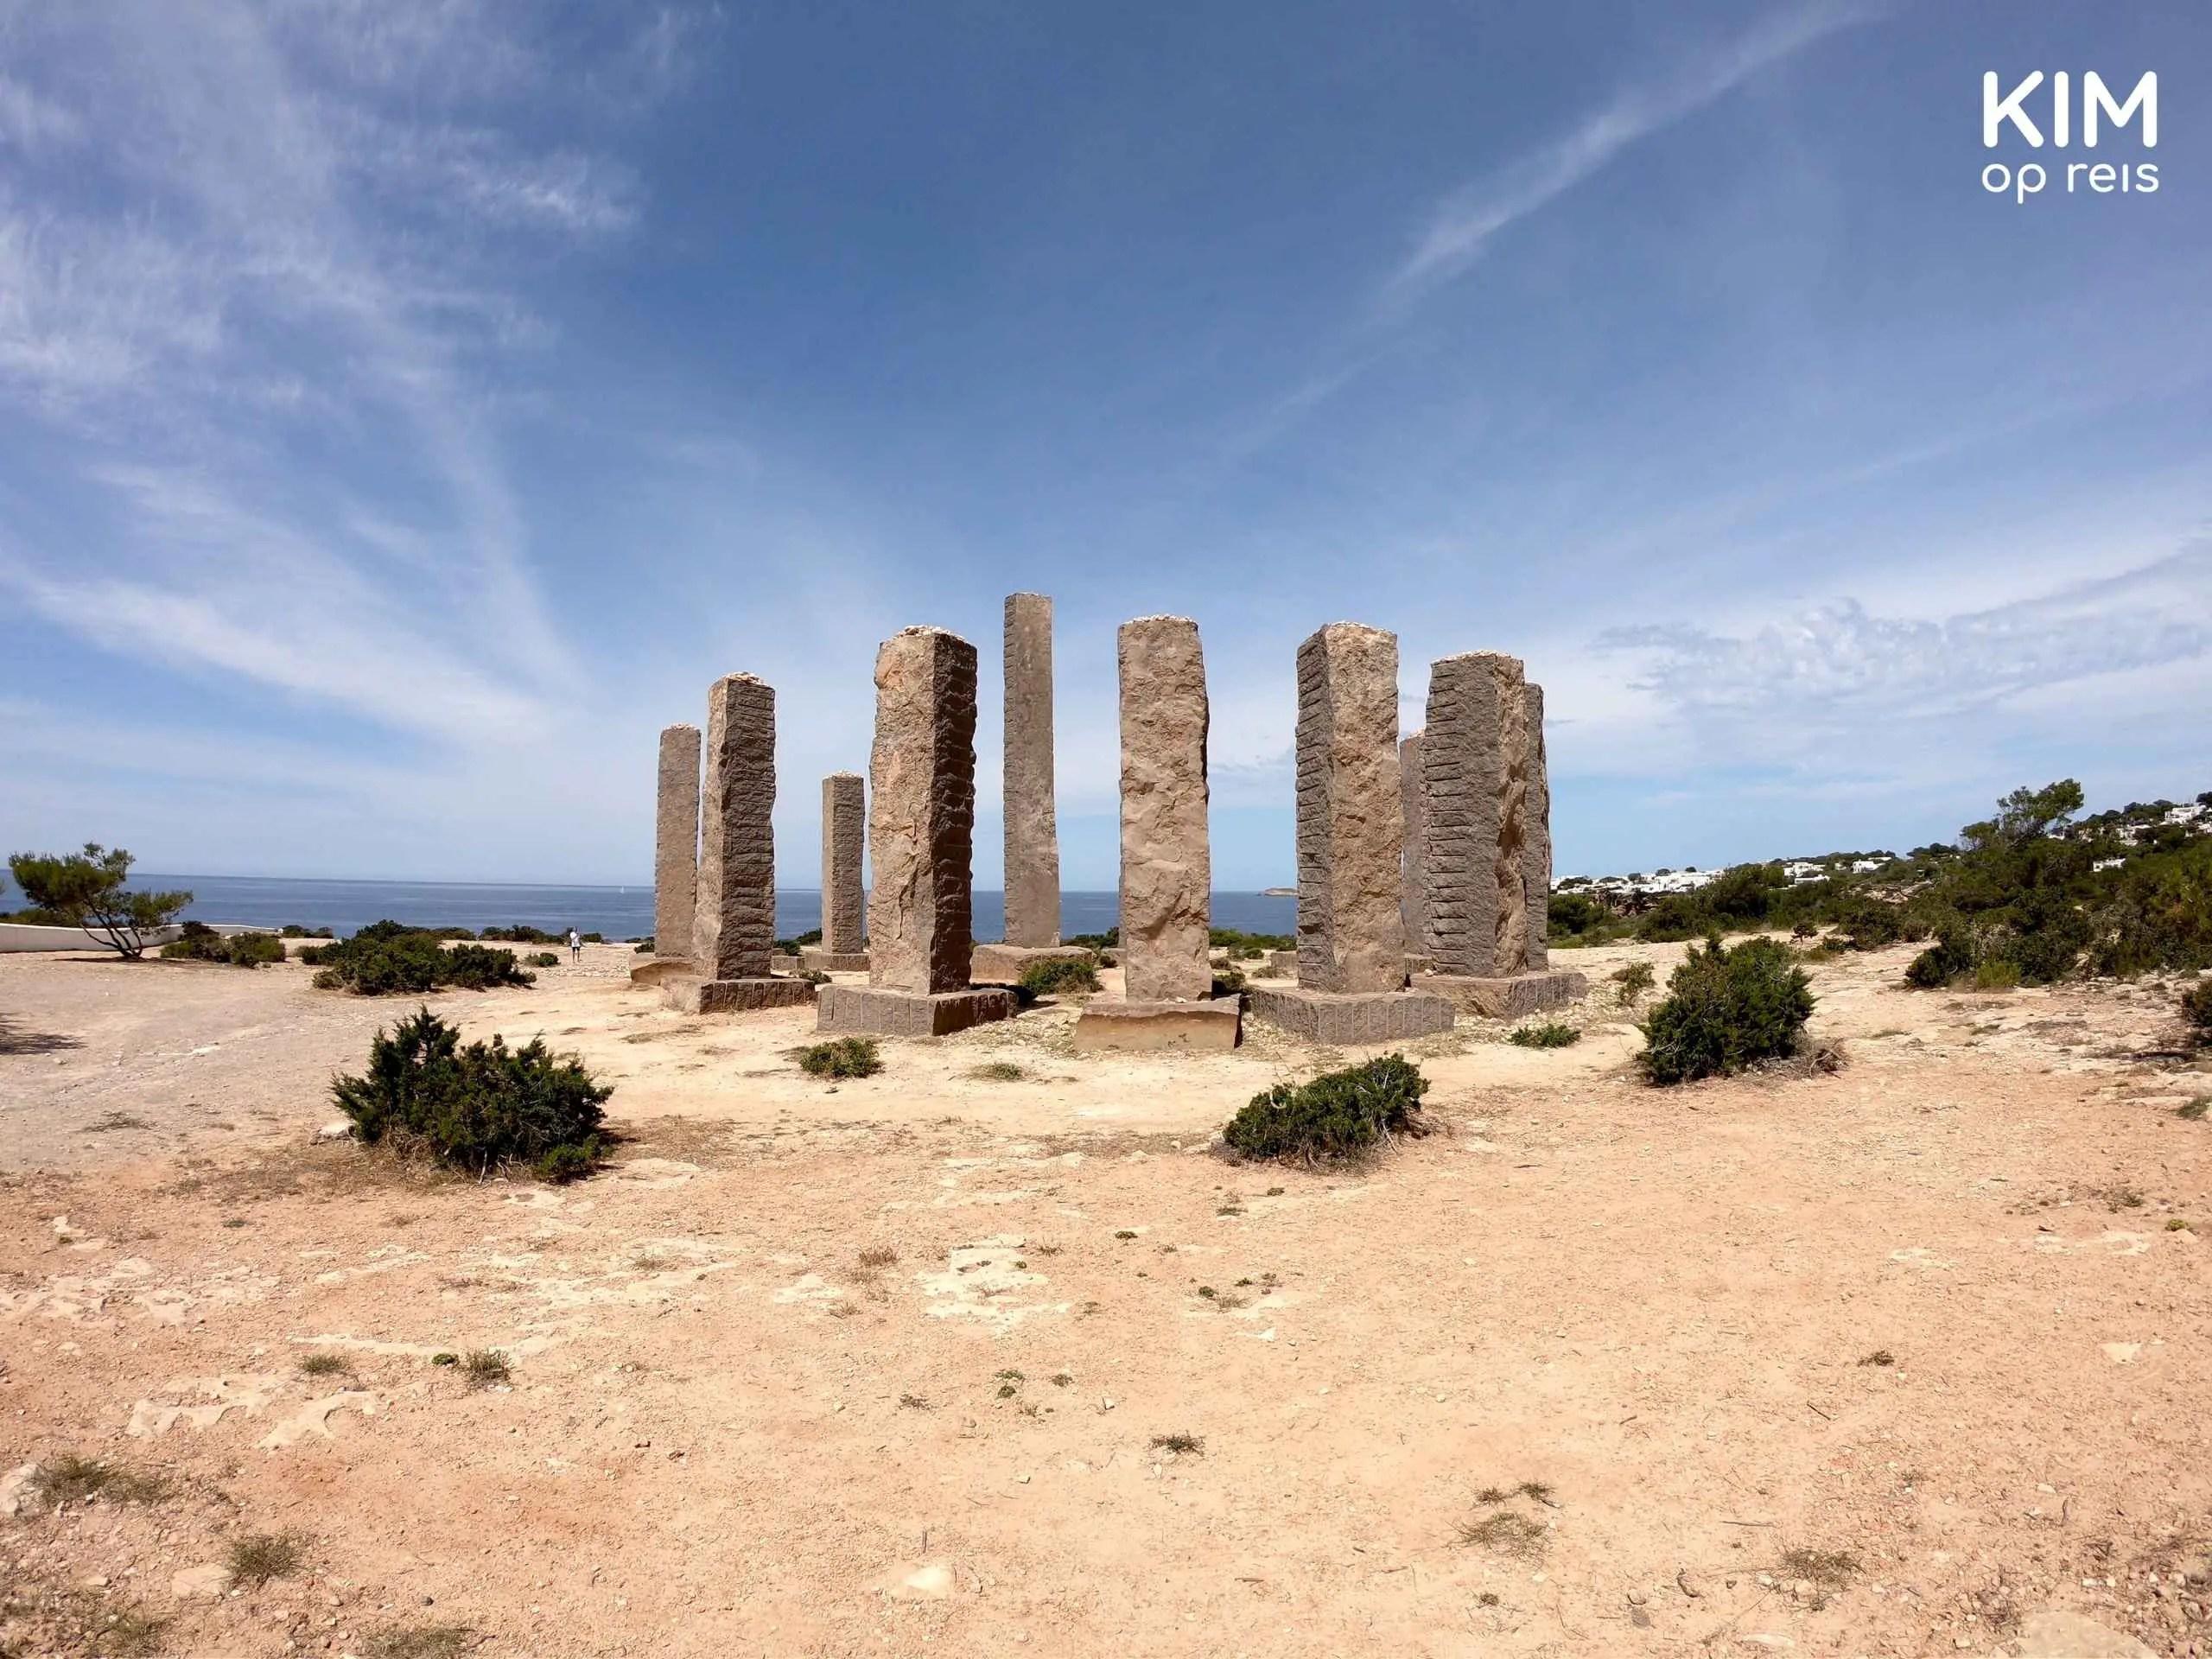 Hidden Ibiza Stonehenge: large pillars in dry ground